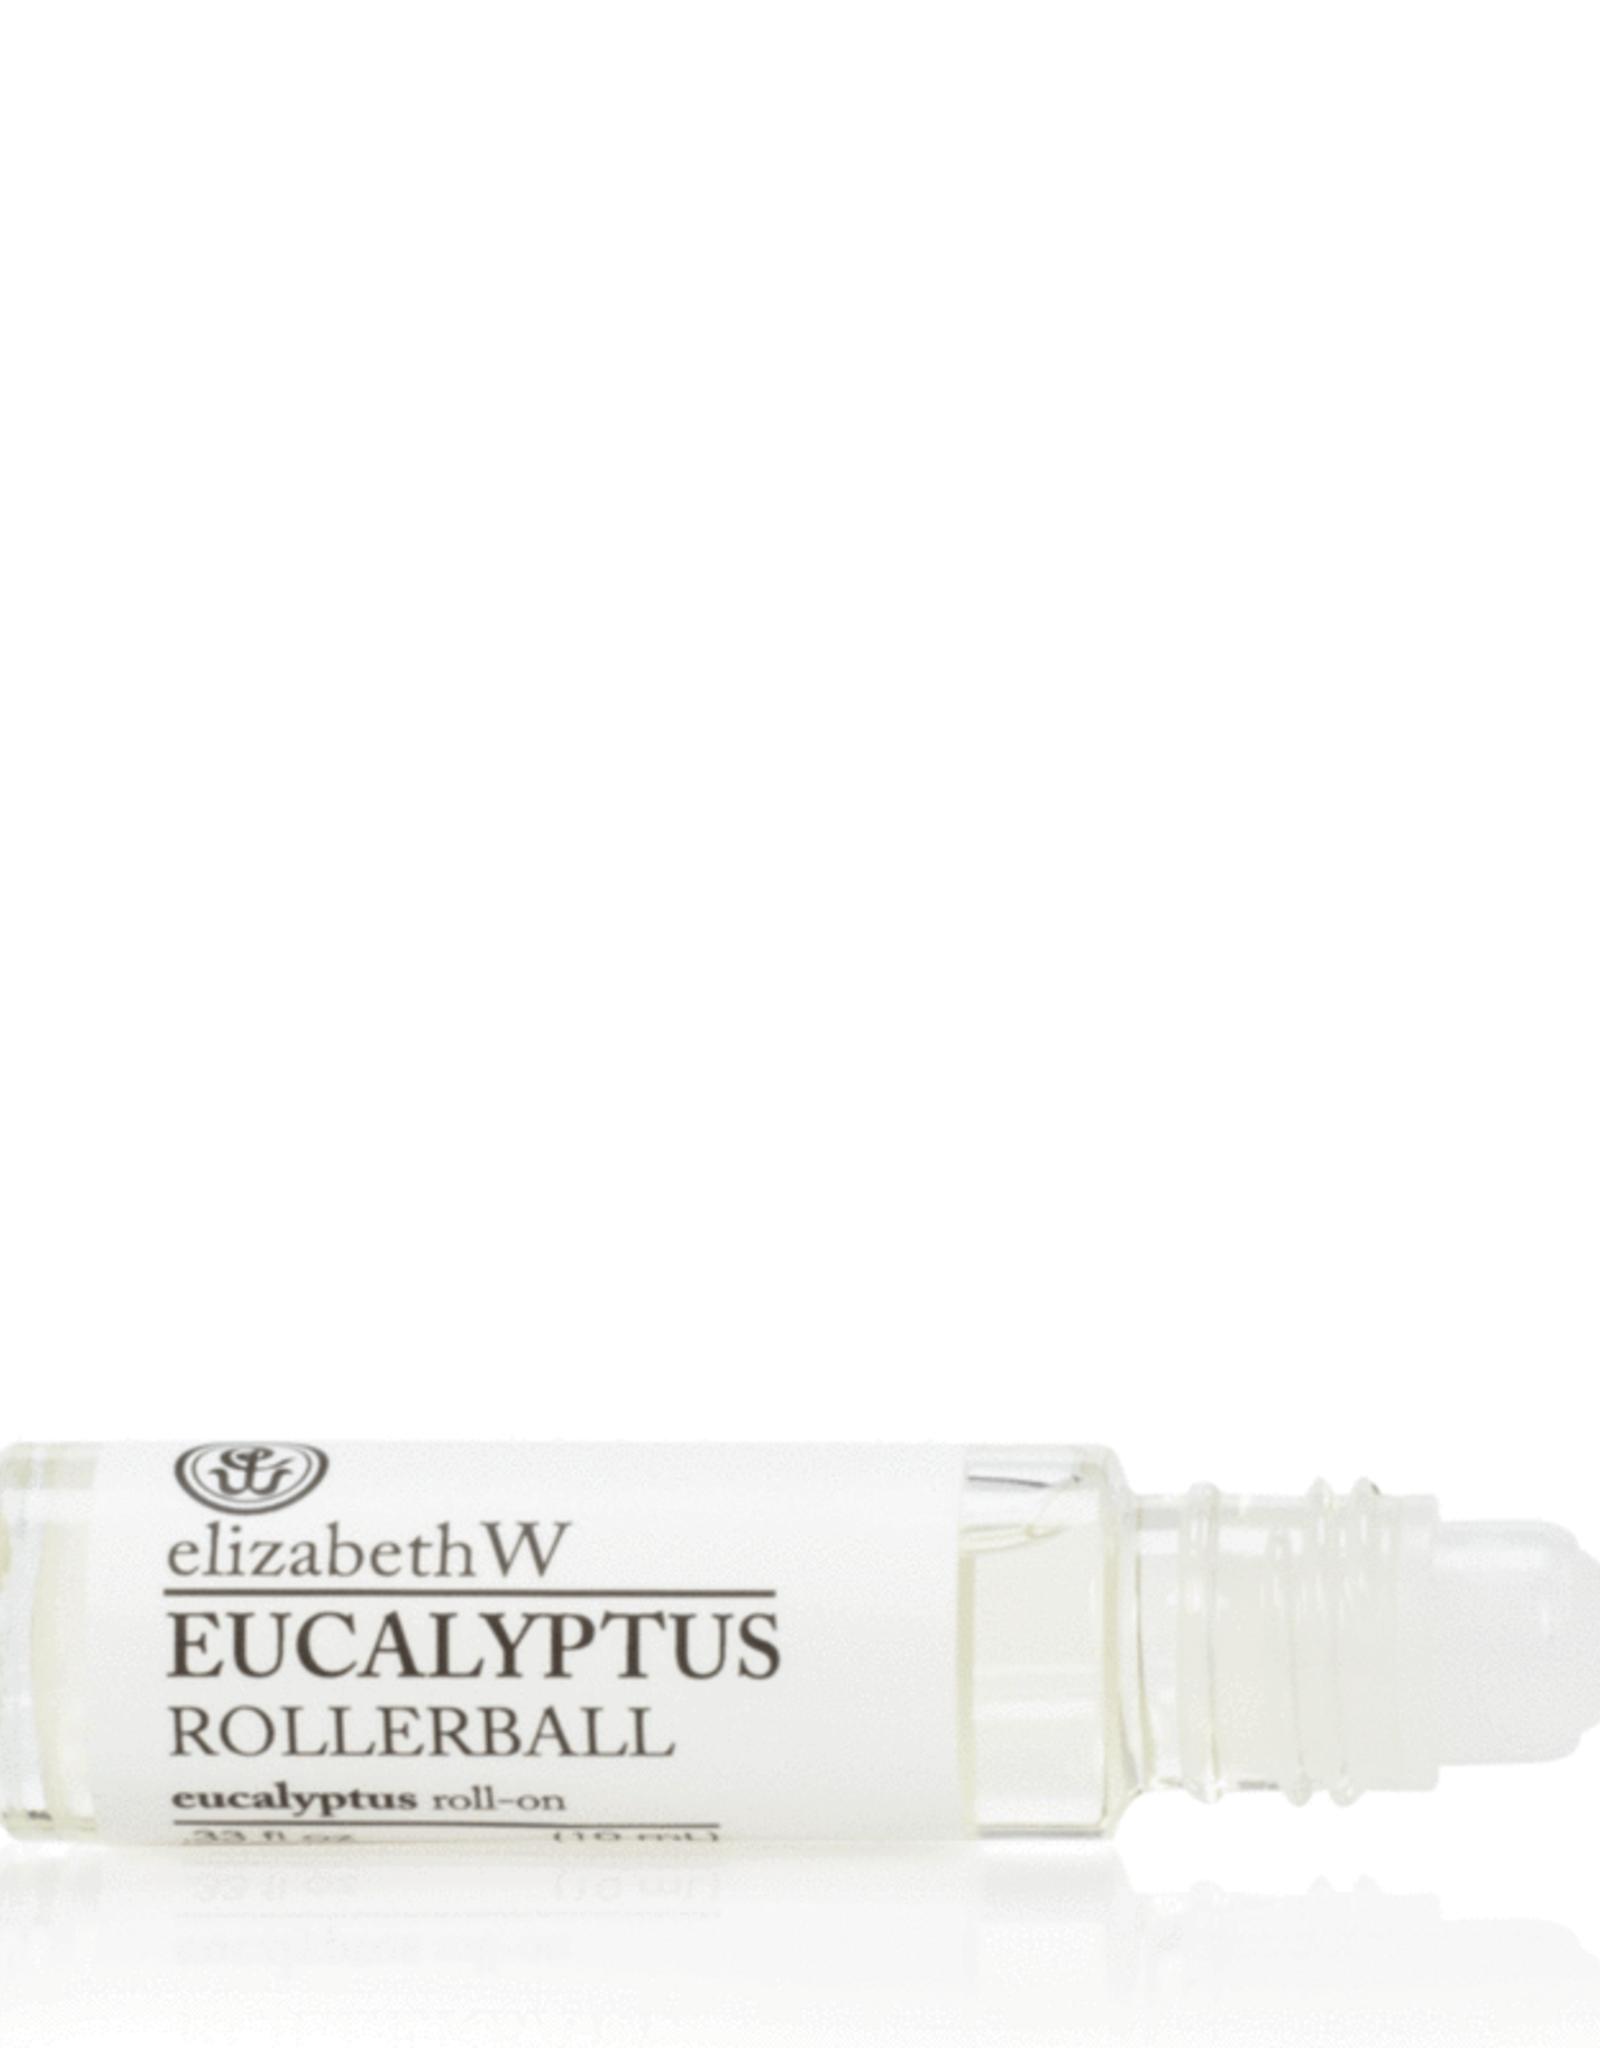 Elizabeth W Eucalyptus Perfume Rollerball